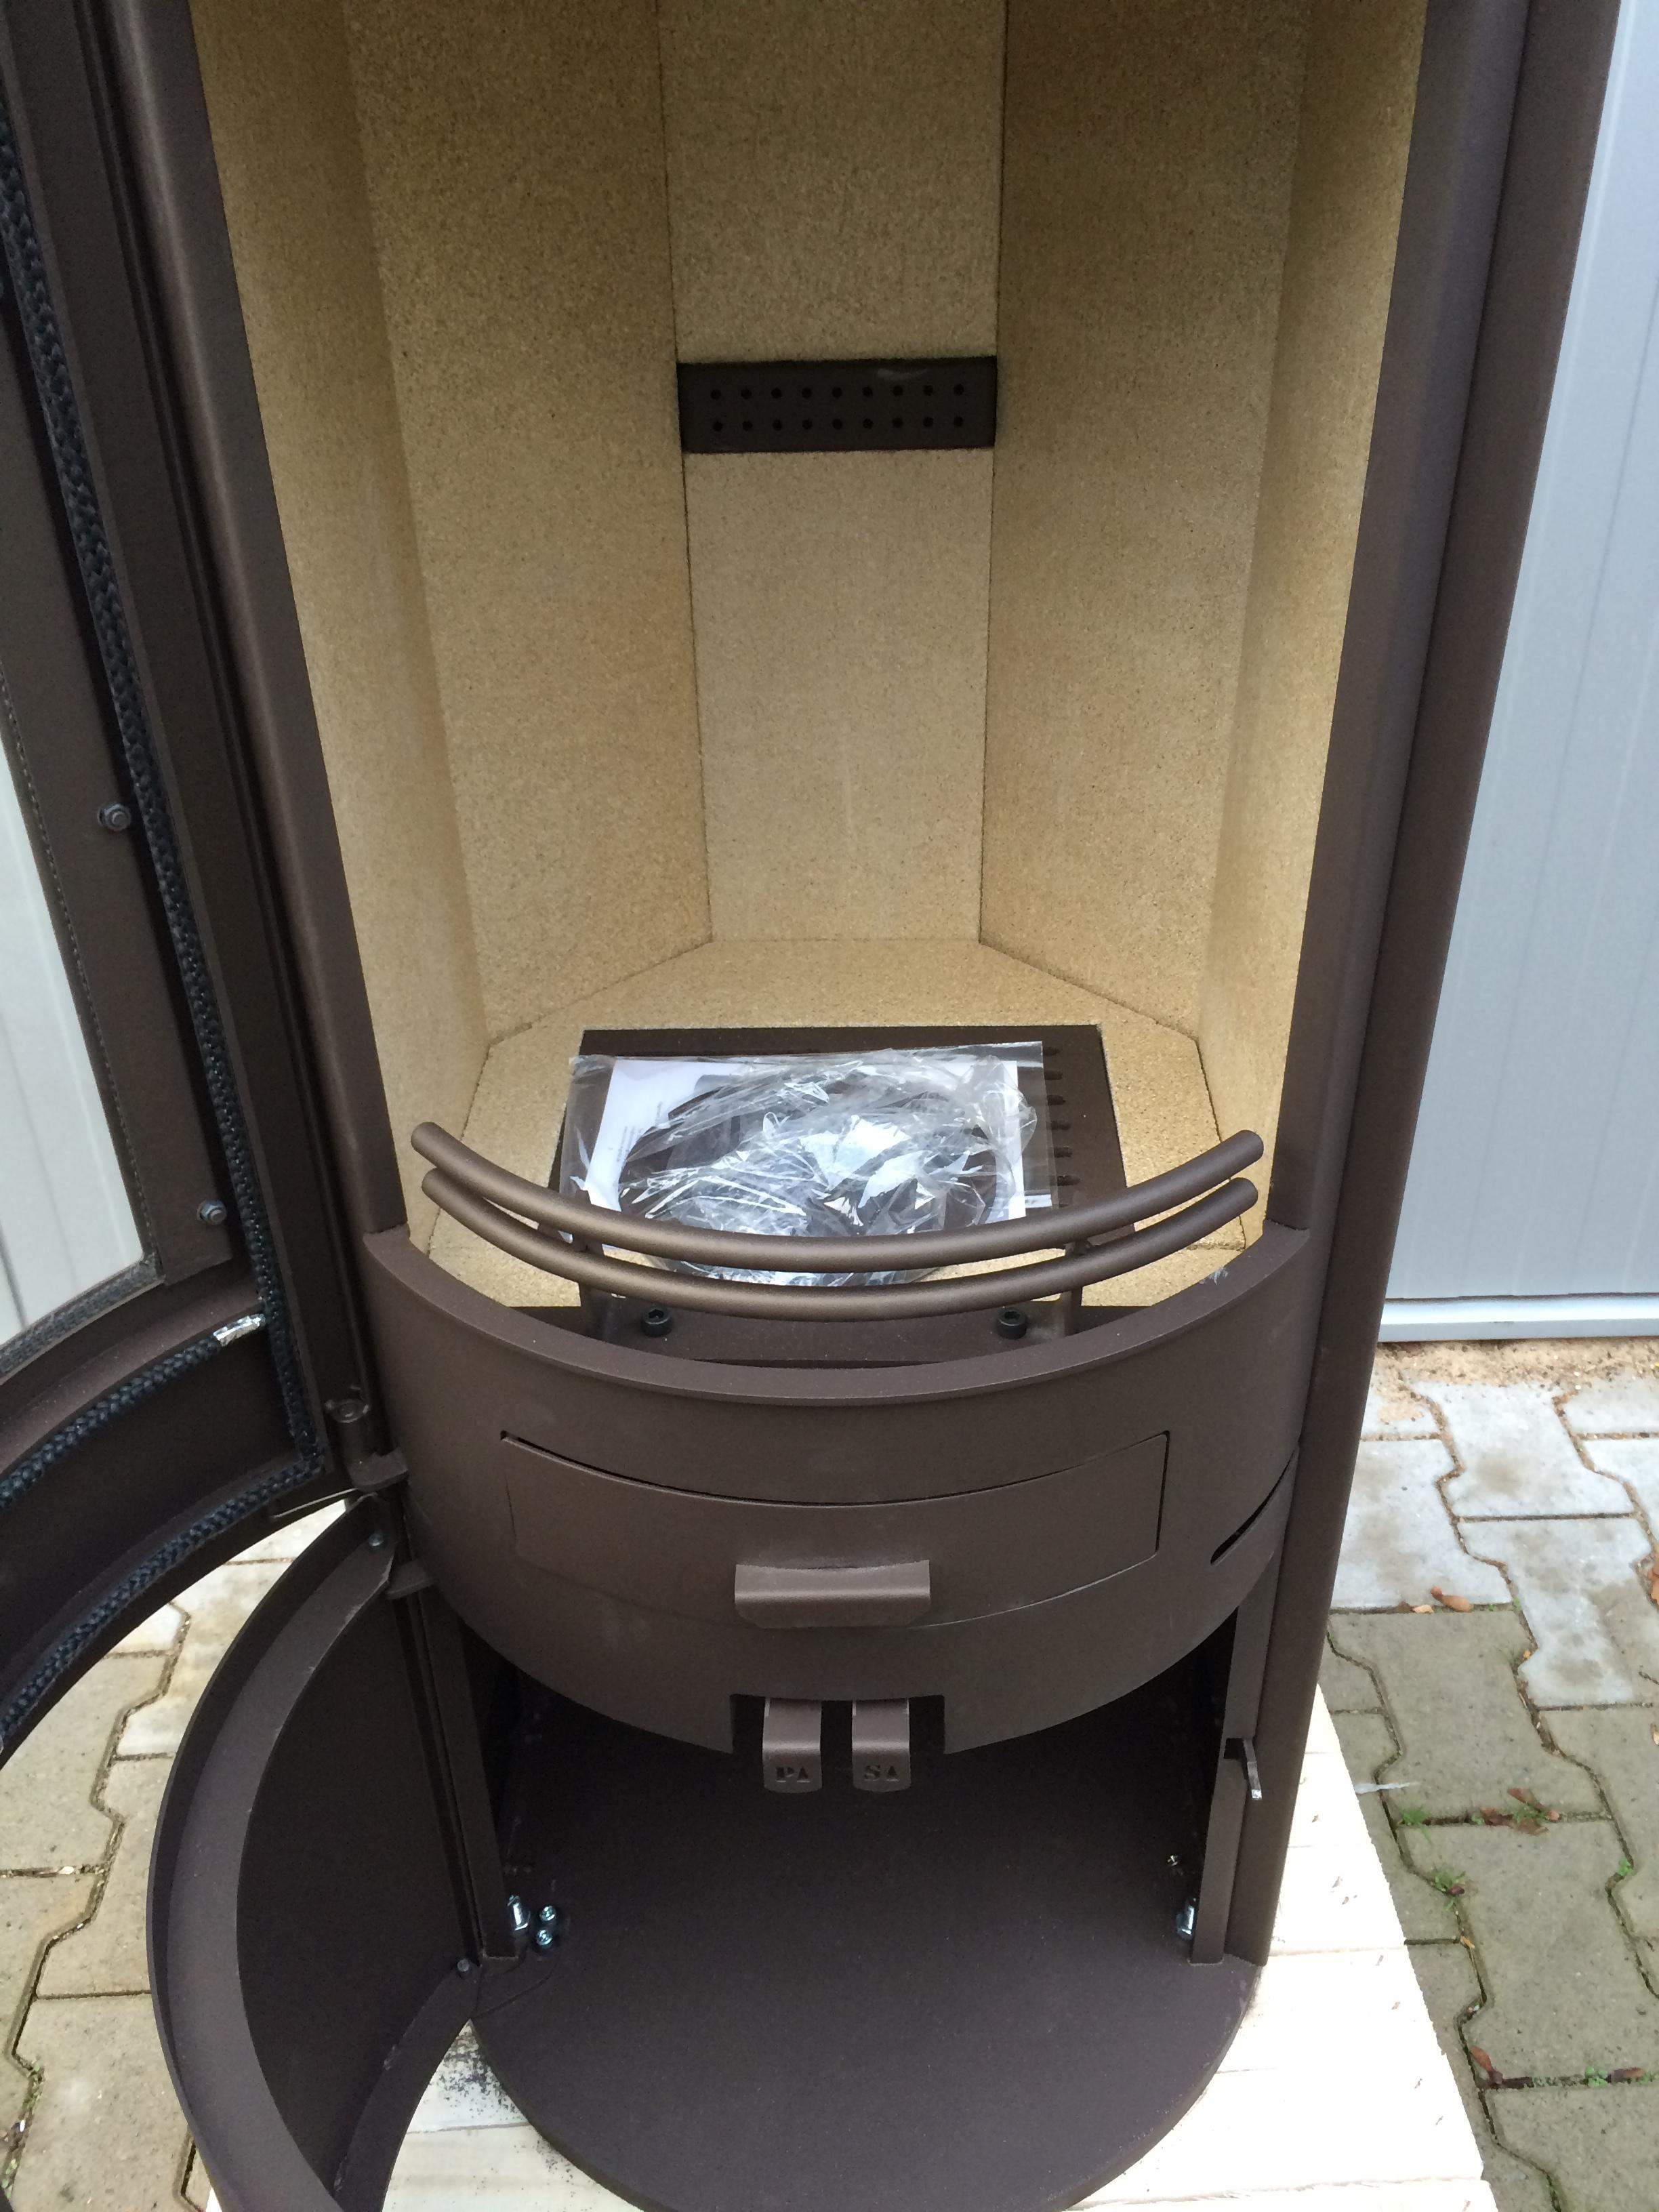 kaminofen kamin schwedenofen ofen h m evo stahl braun 2 wahl. Black Bedroom Furniture Sets. Home Design Ideas